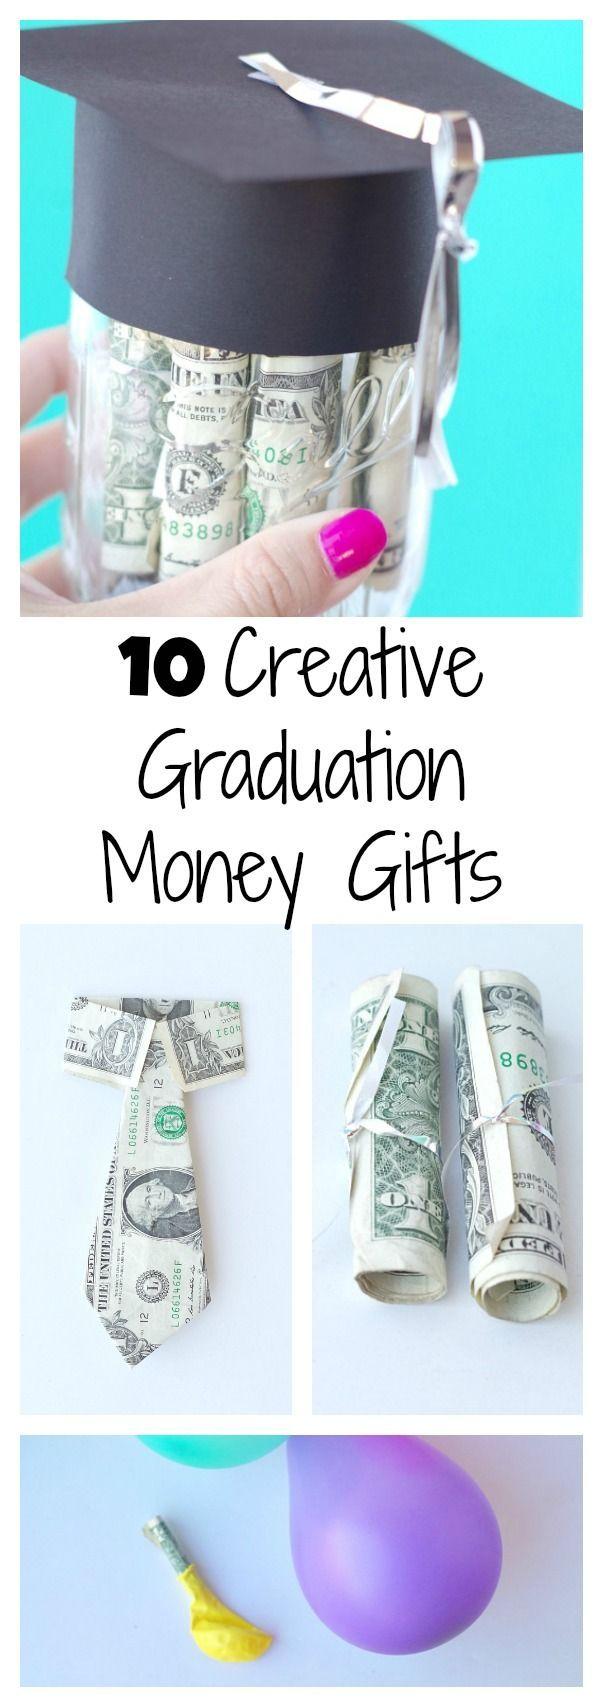 10 Creative Graduation Money Gifts!